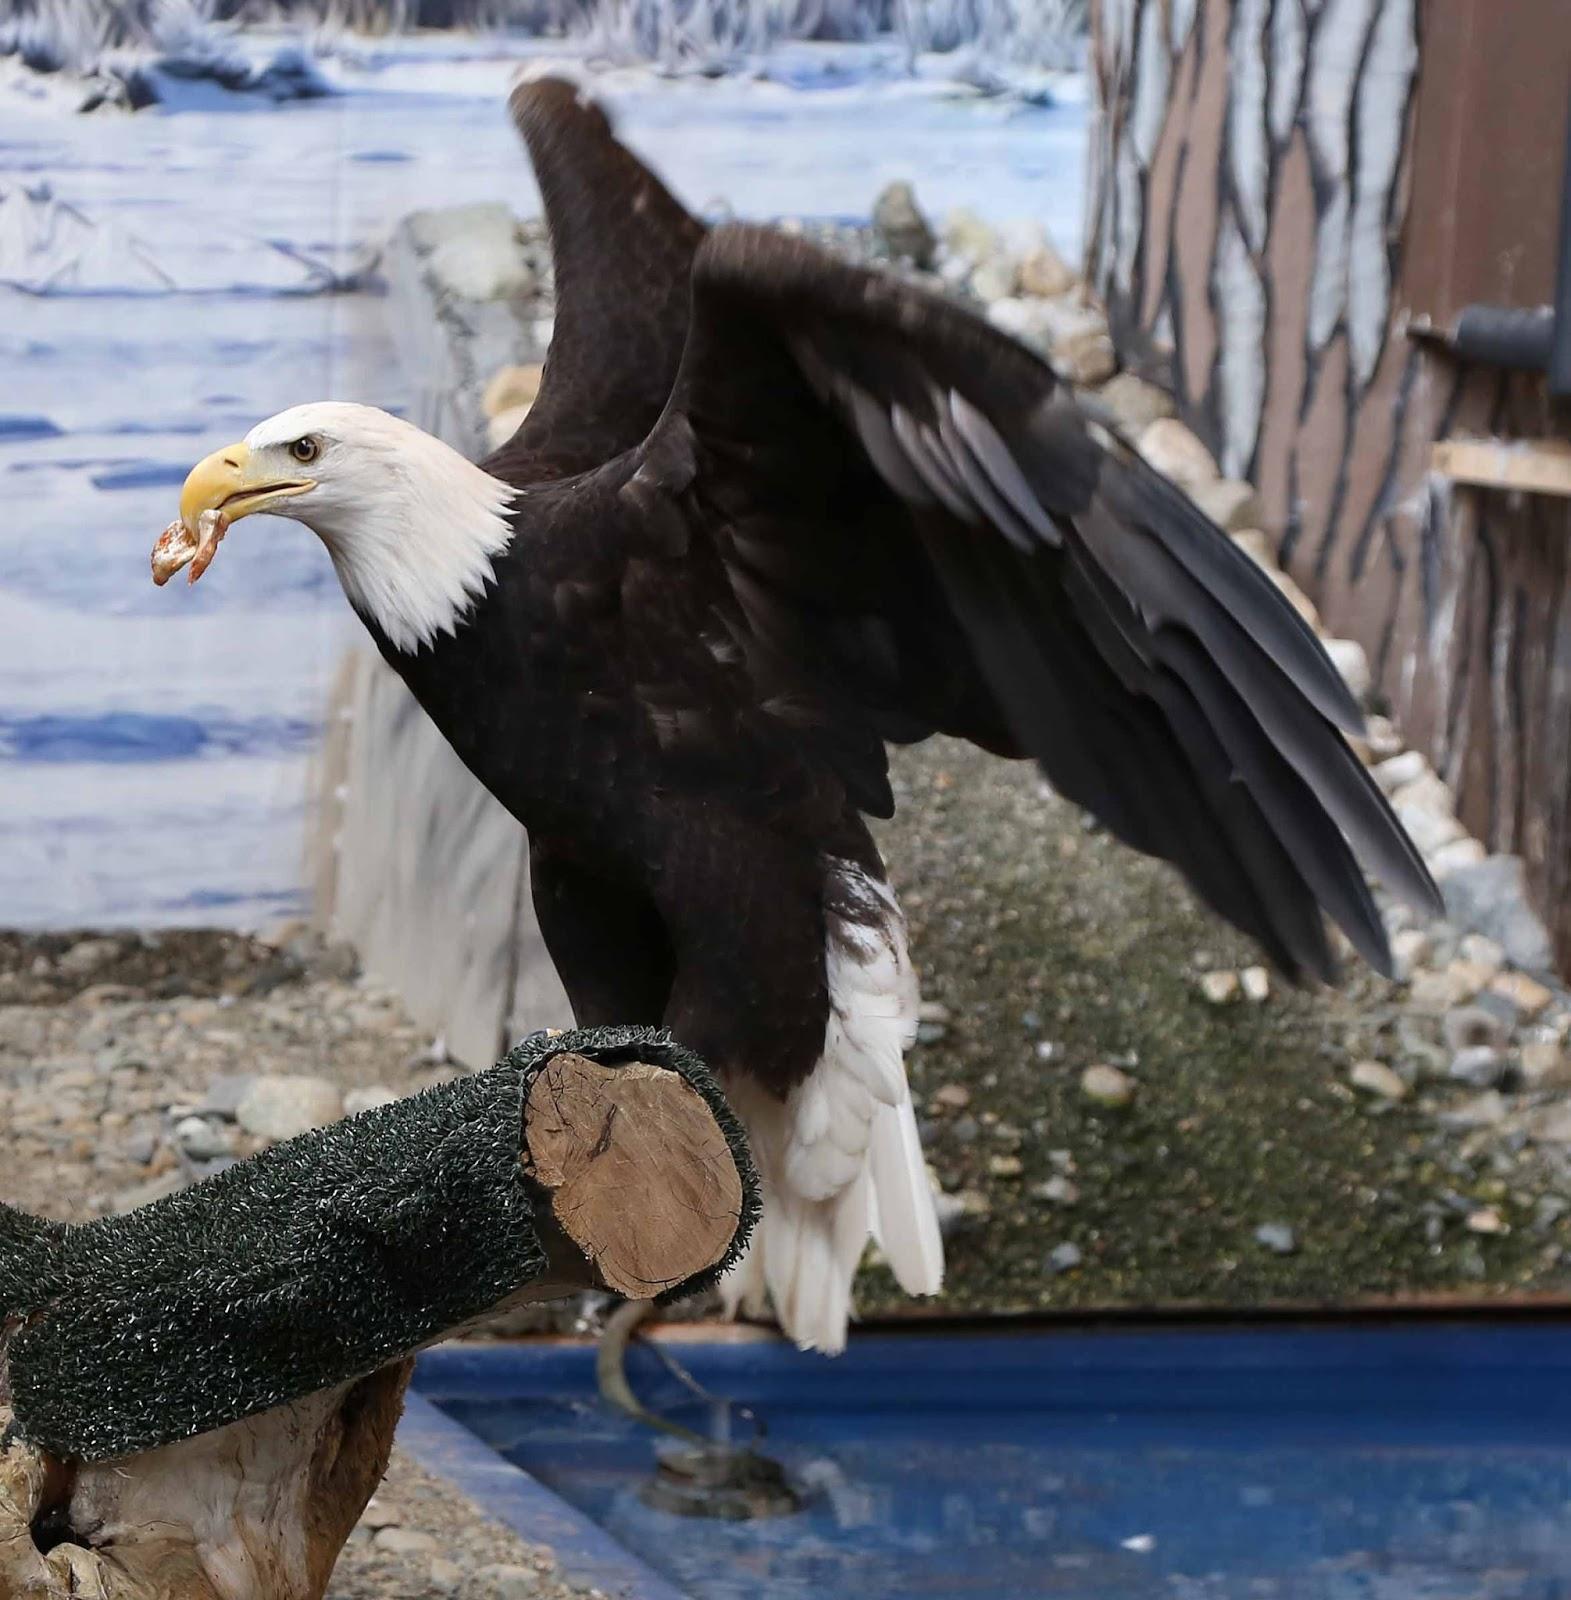 Eagle wings folded